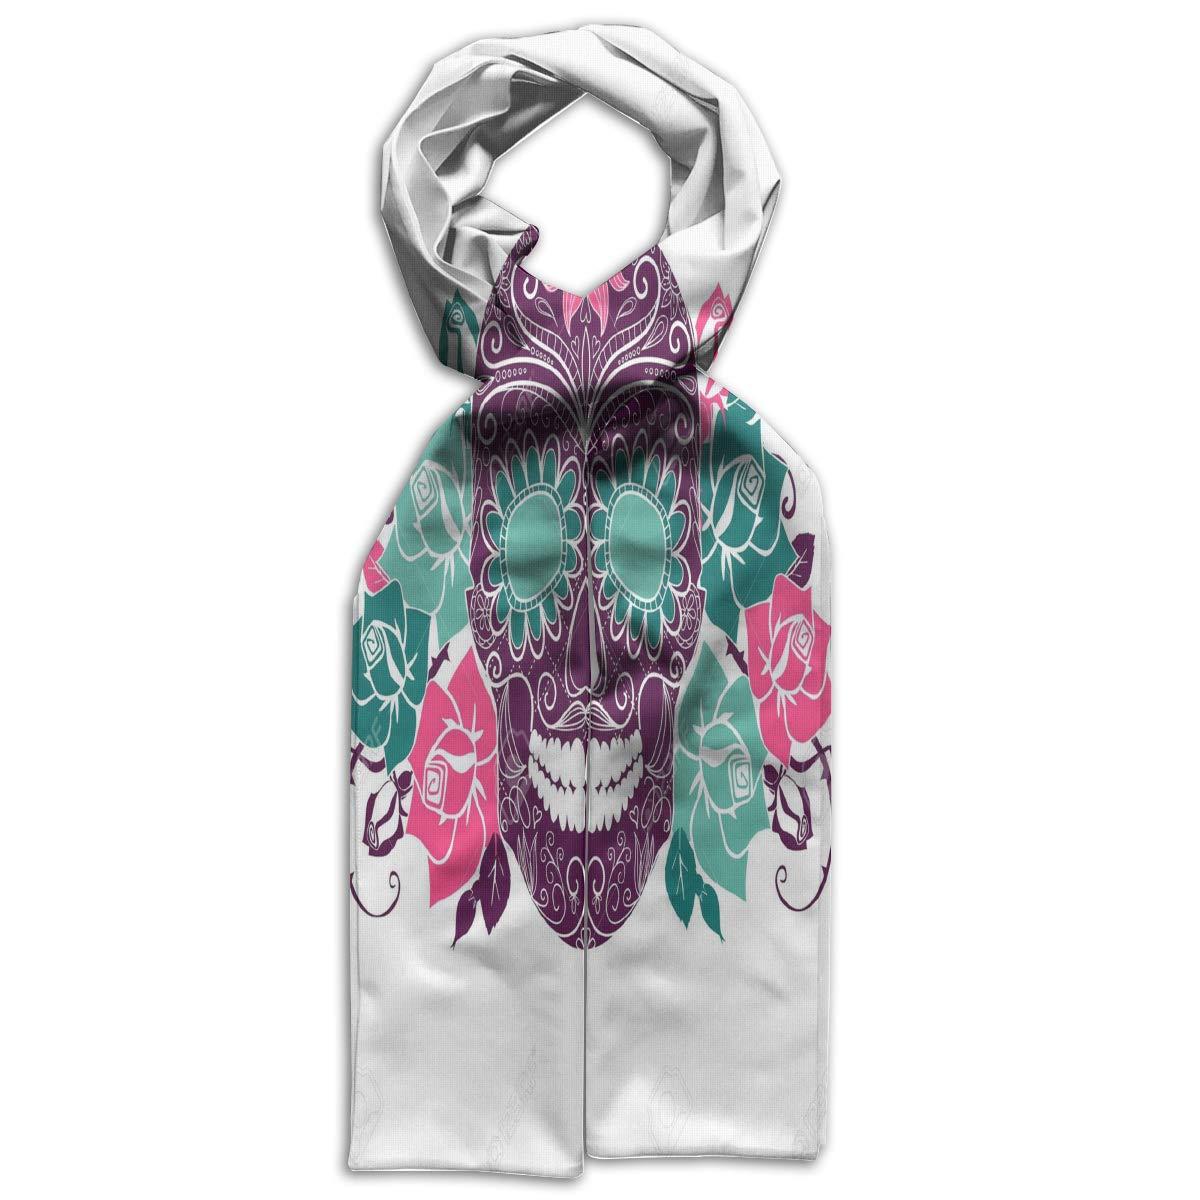 Kids Scarf Flower Skull Neckerchief Winter Warm Gift For Callant